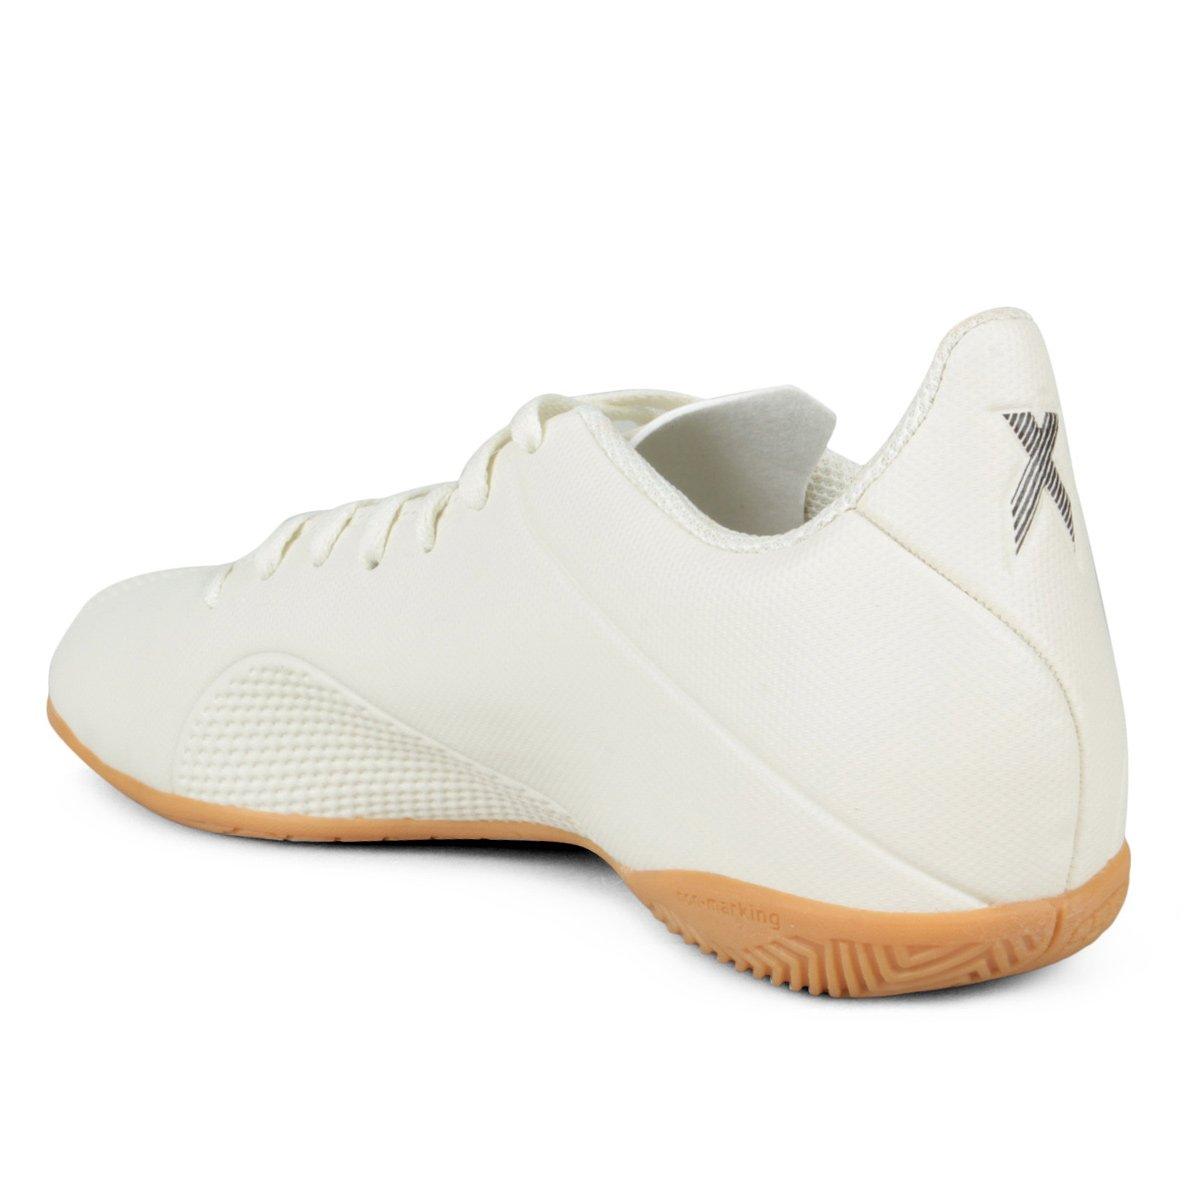 51a821cab6061 Chuteira Futsal Adidas X Tango 18 4 IN - Tam: 39 - Shopping TudoAzul